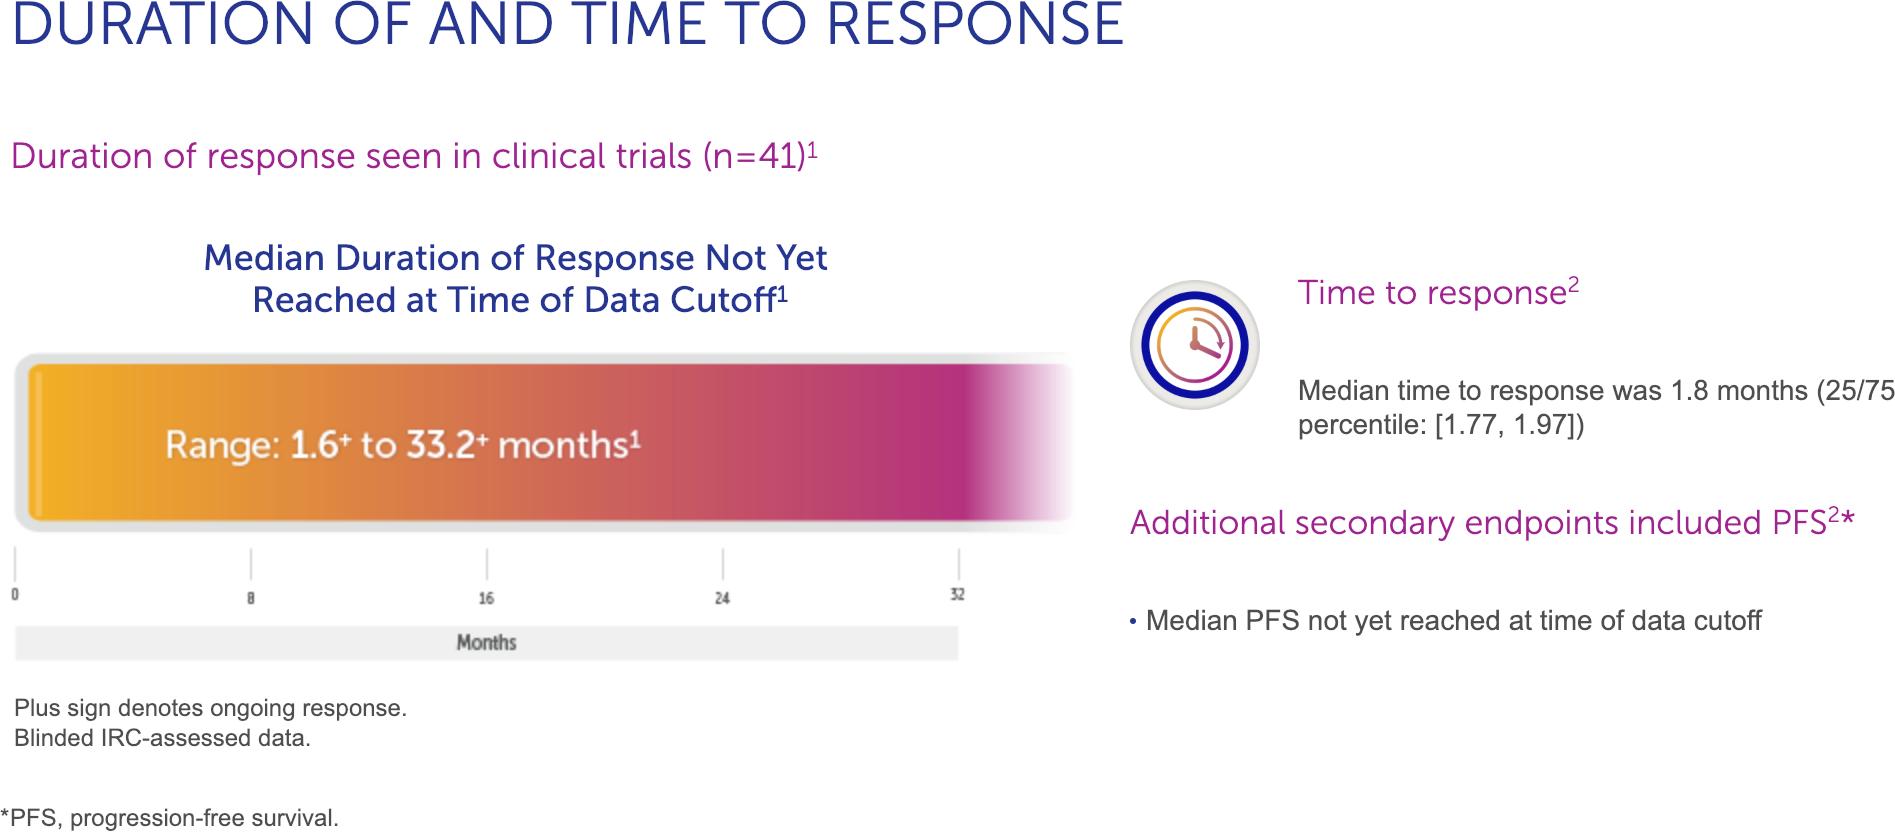 vitrakvi clinical trials results 02 - «Витракви»: лечение любых солидных опухолей